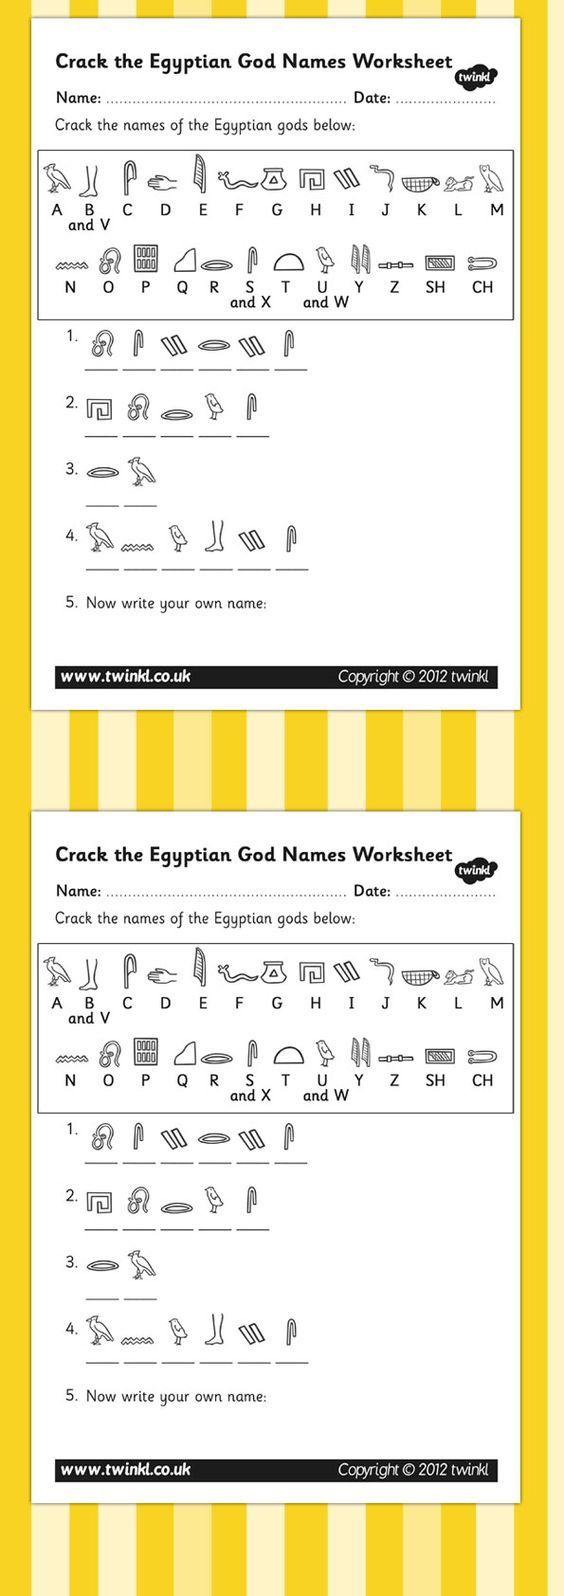 worksheet Ancient Egypt Worksheet ks2 ancient egypt crack the hieroglyphs egyptian gods names worksheets